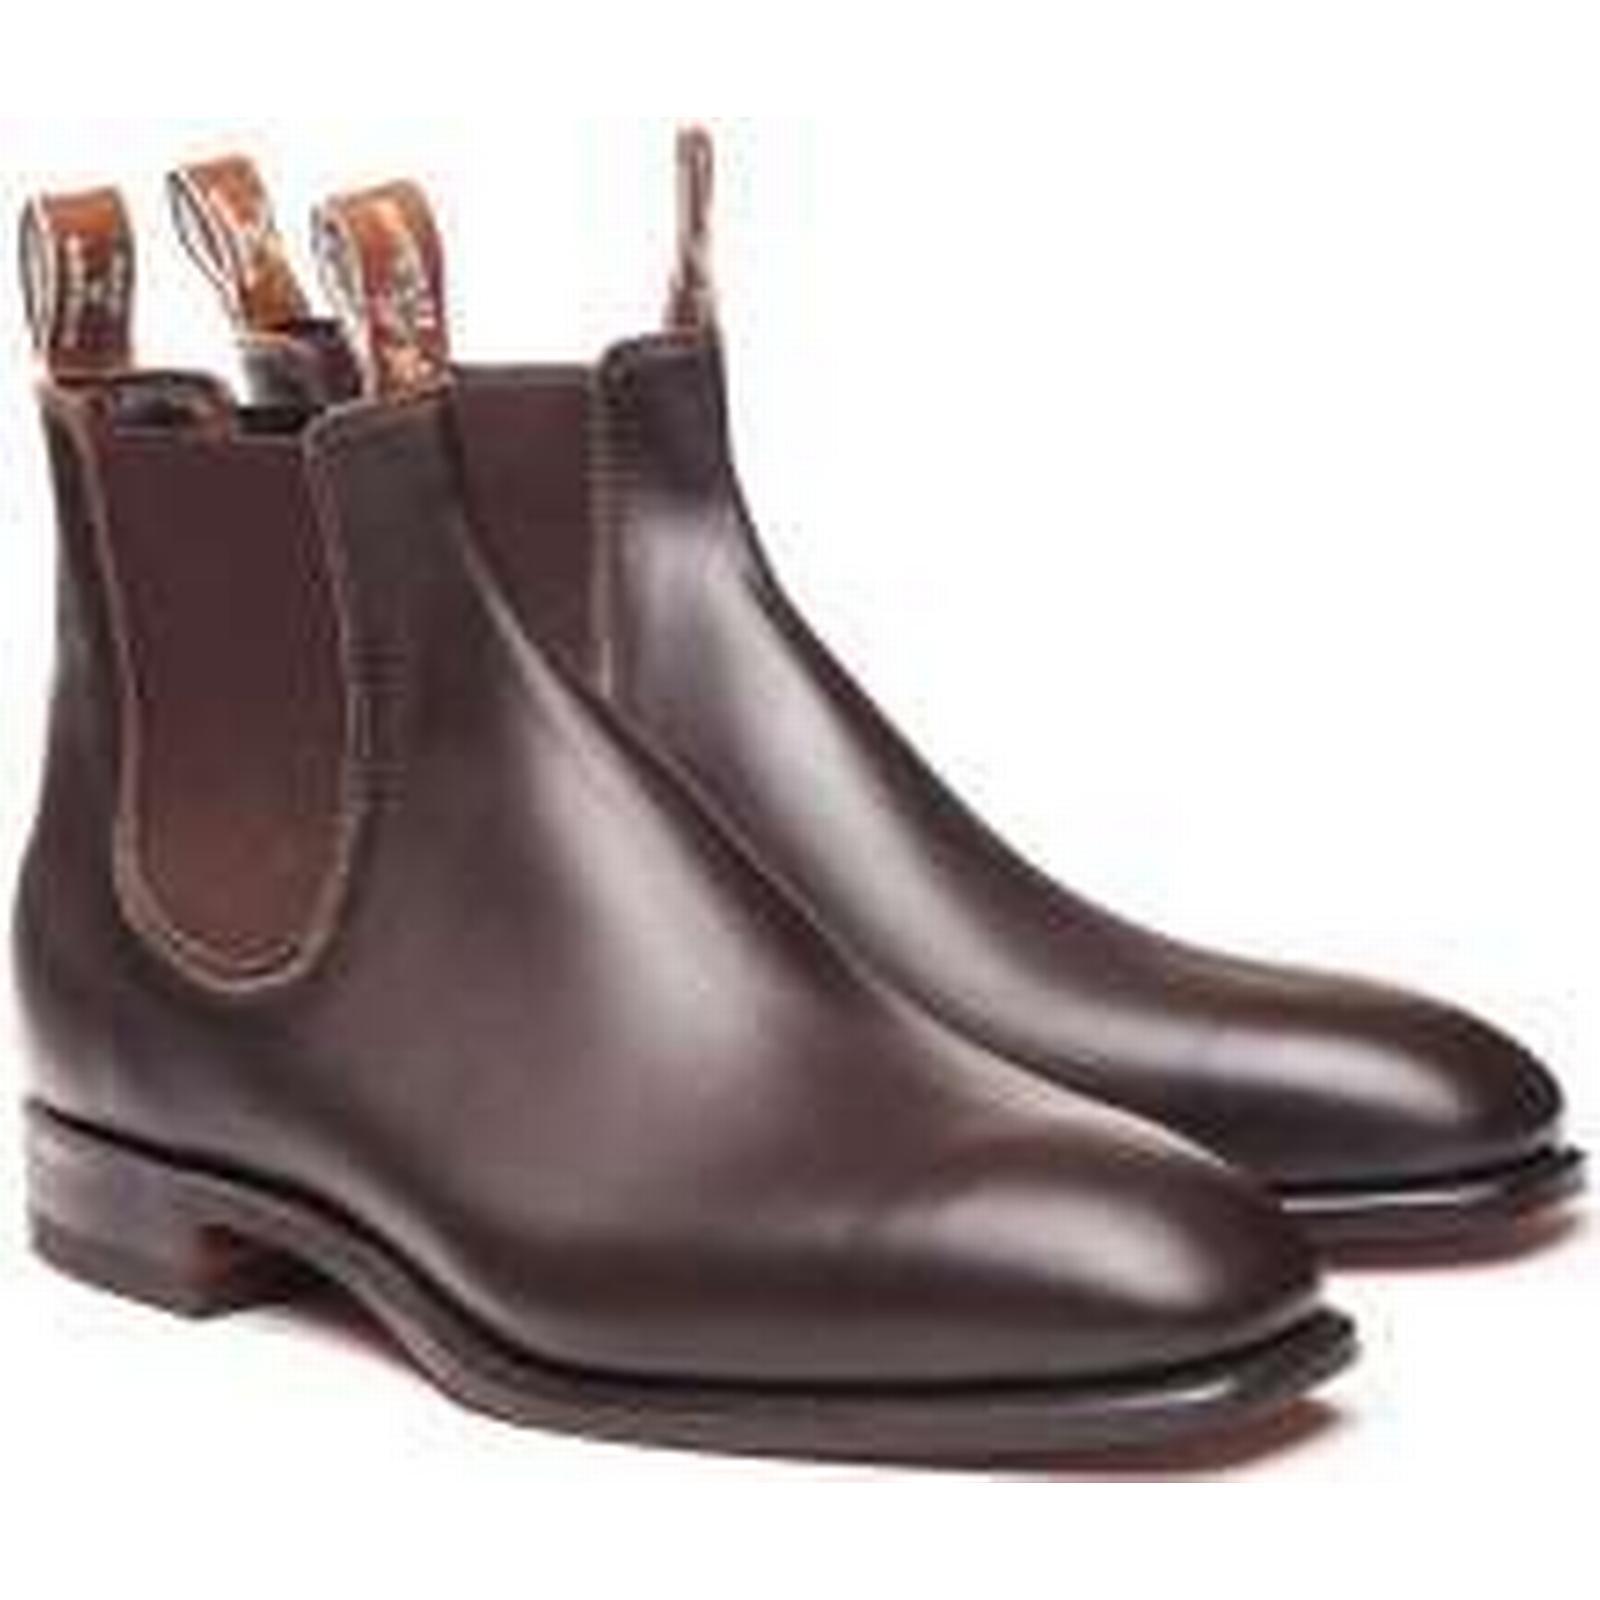 R.M. Regular Williams Craftsman Boots, Chestnut Regular R.M. G Fit, UK8 c21bf4